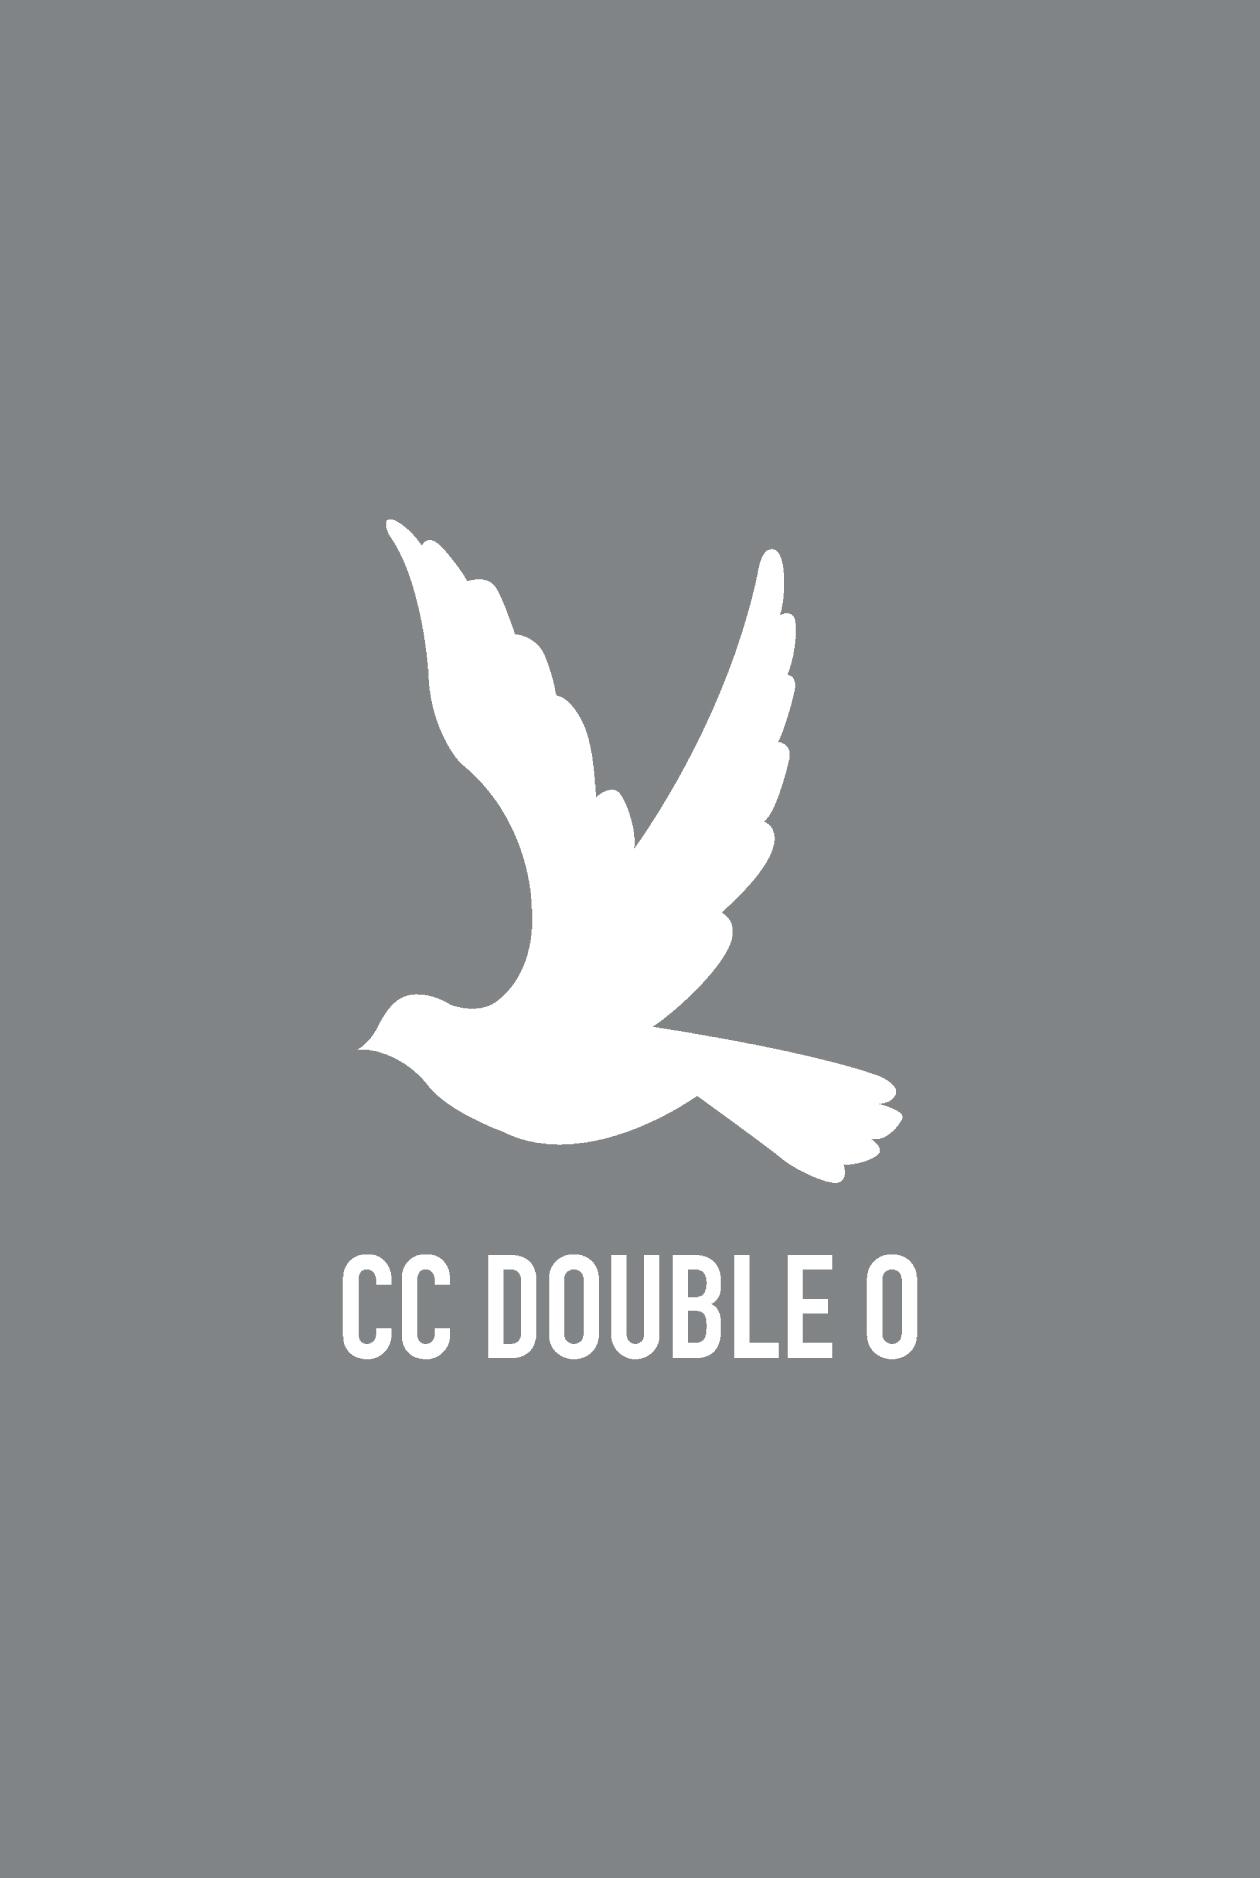 Bird Logo Bomber Jacket with Checkered Detail